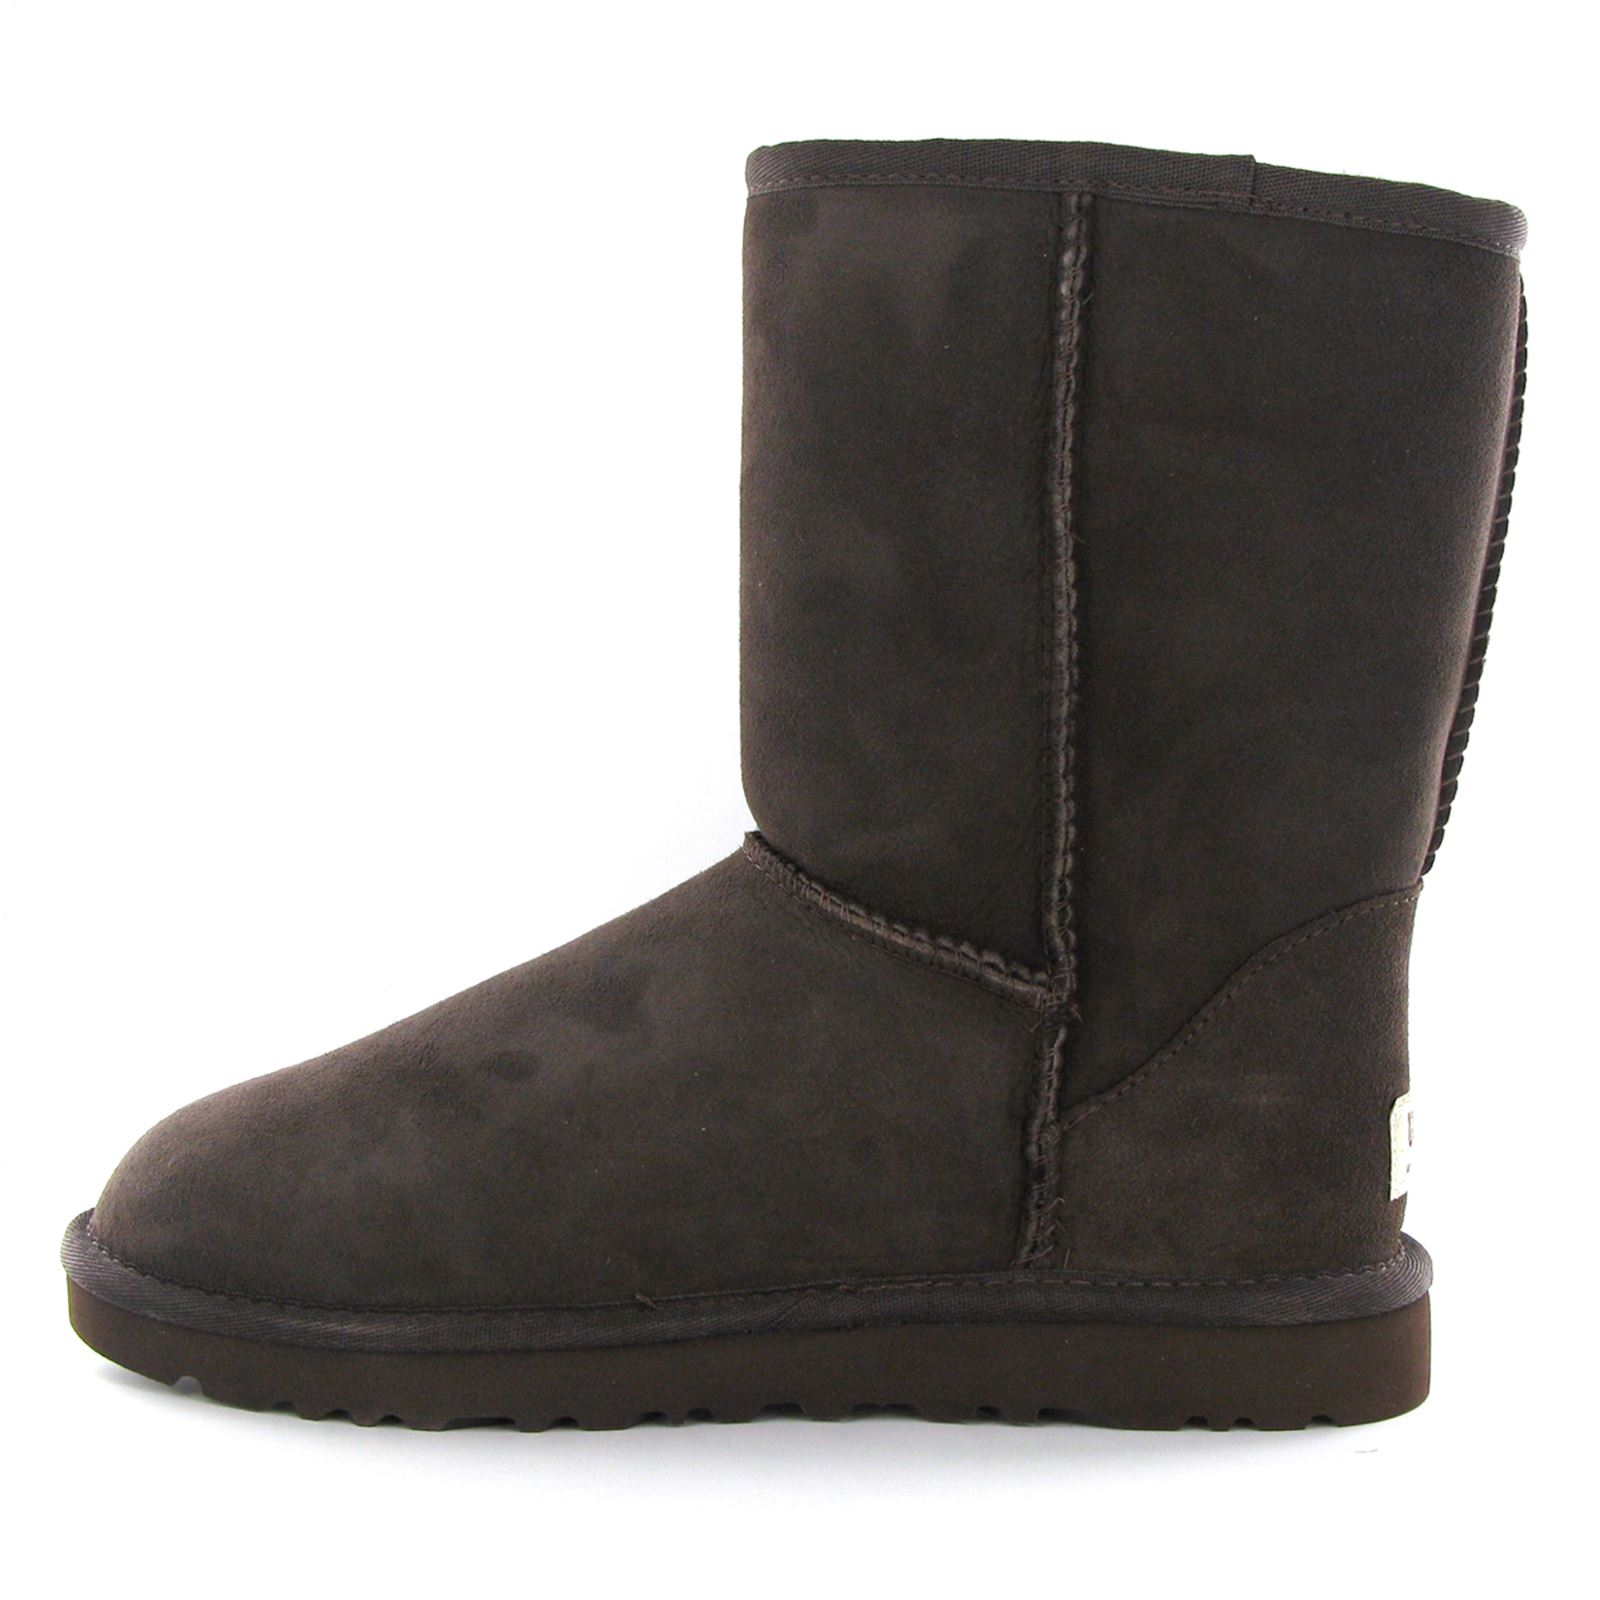 ugg australia classic short sheepskin womens boots. Black Bedroom Furniture Sets. Home Design Ideas